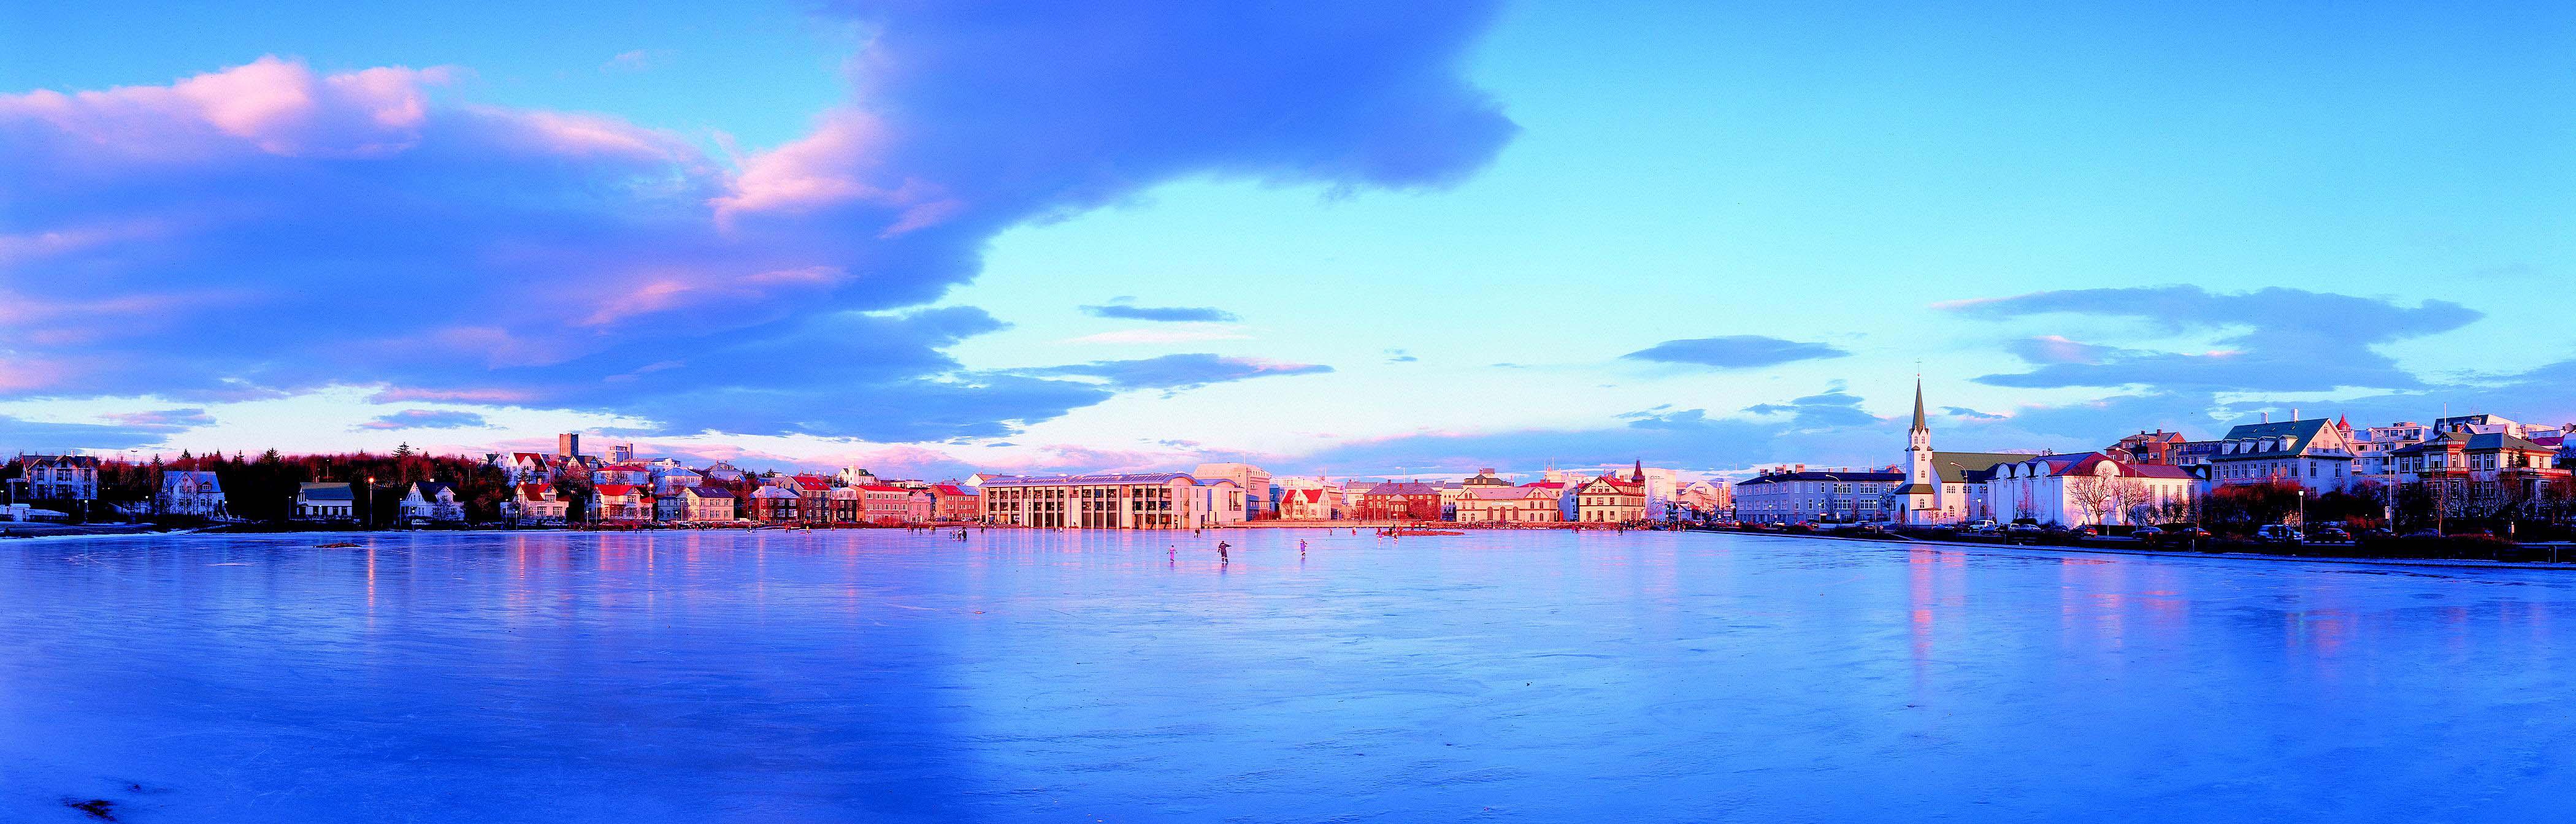 Island, Suedisland, Reykjavik, Tjoernin, Hauptstadt, Winter, Eis,